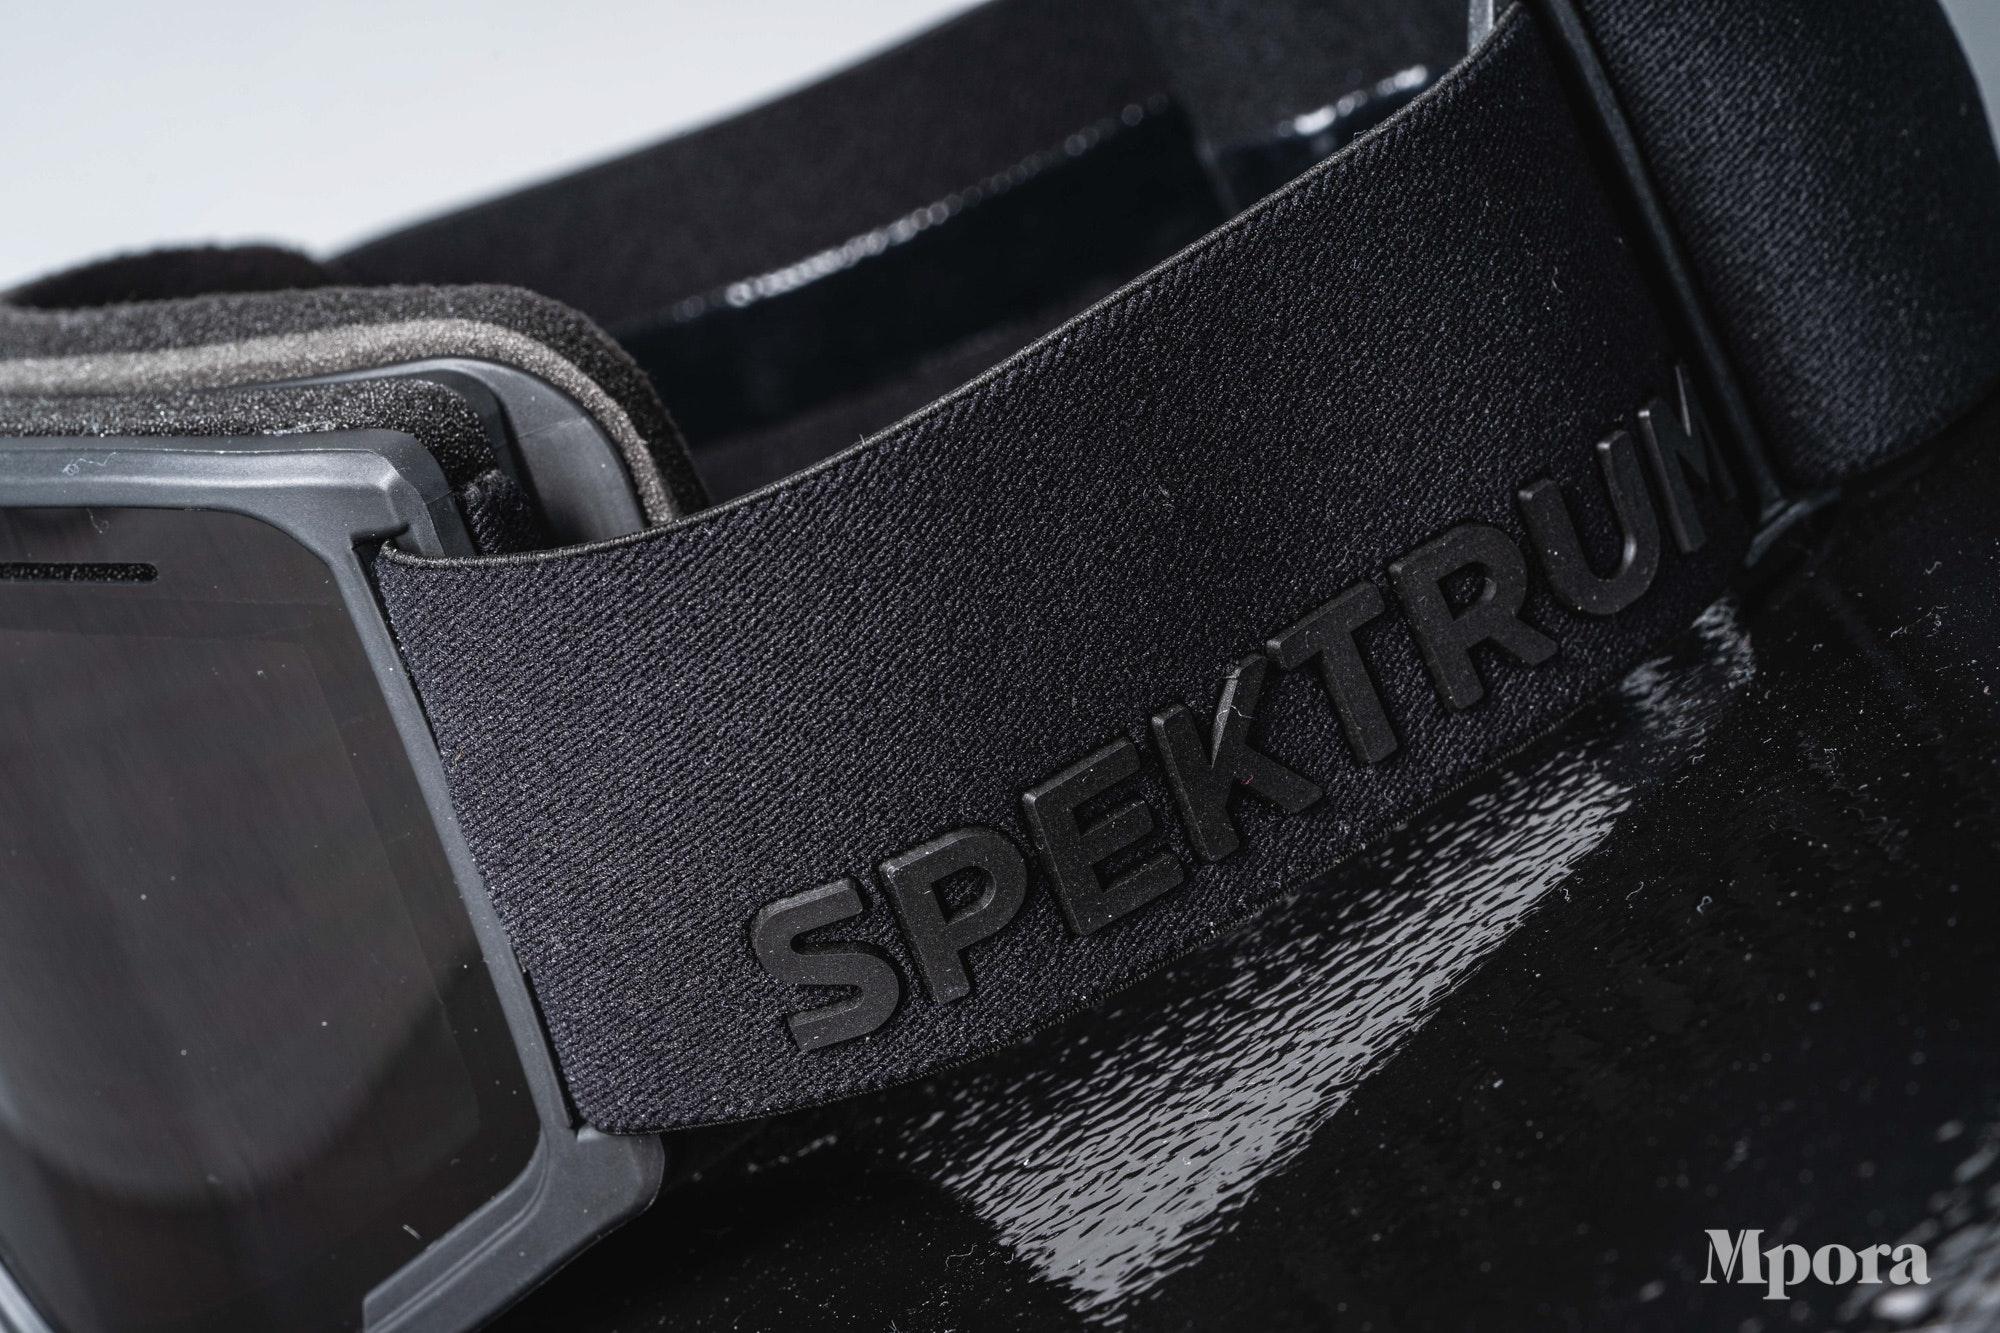 spektrum-templet-essential-review